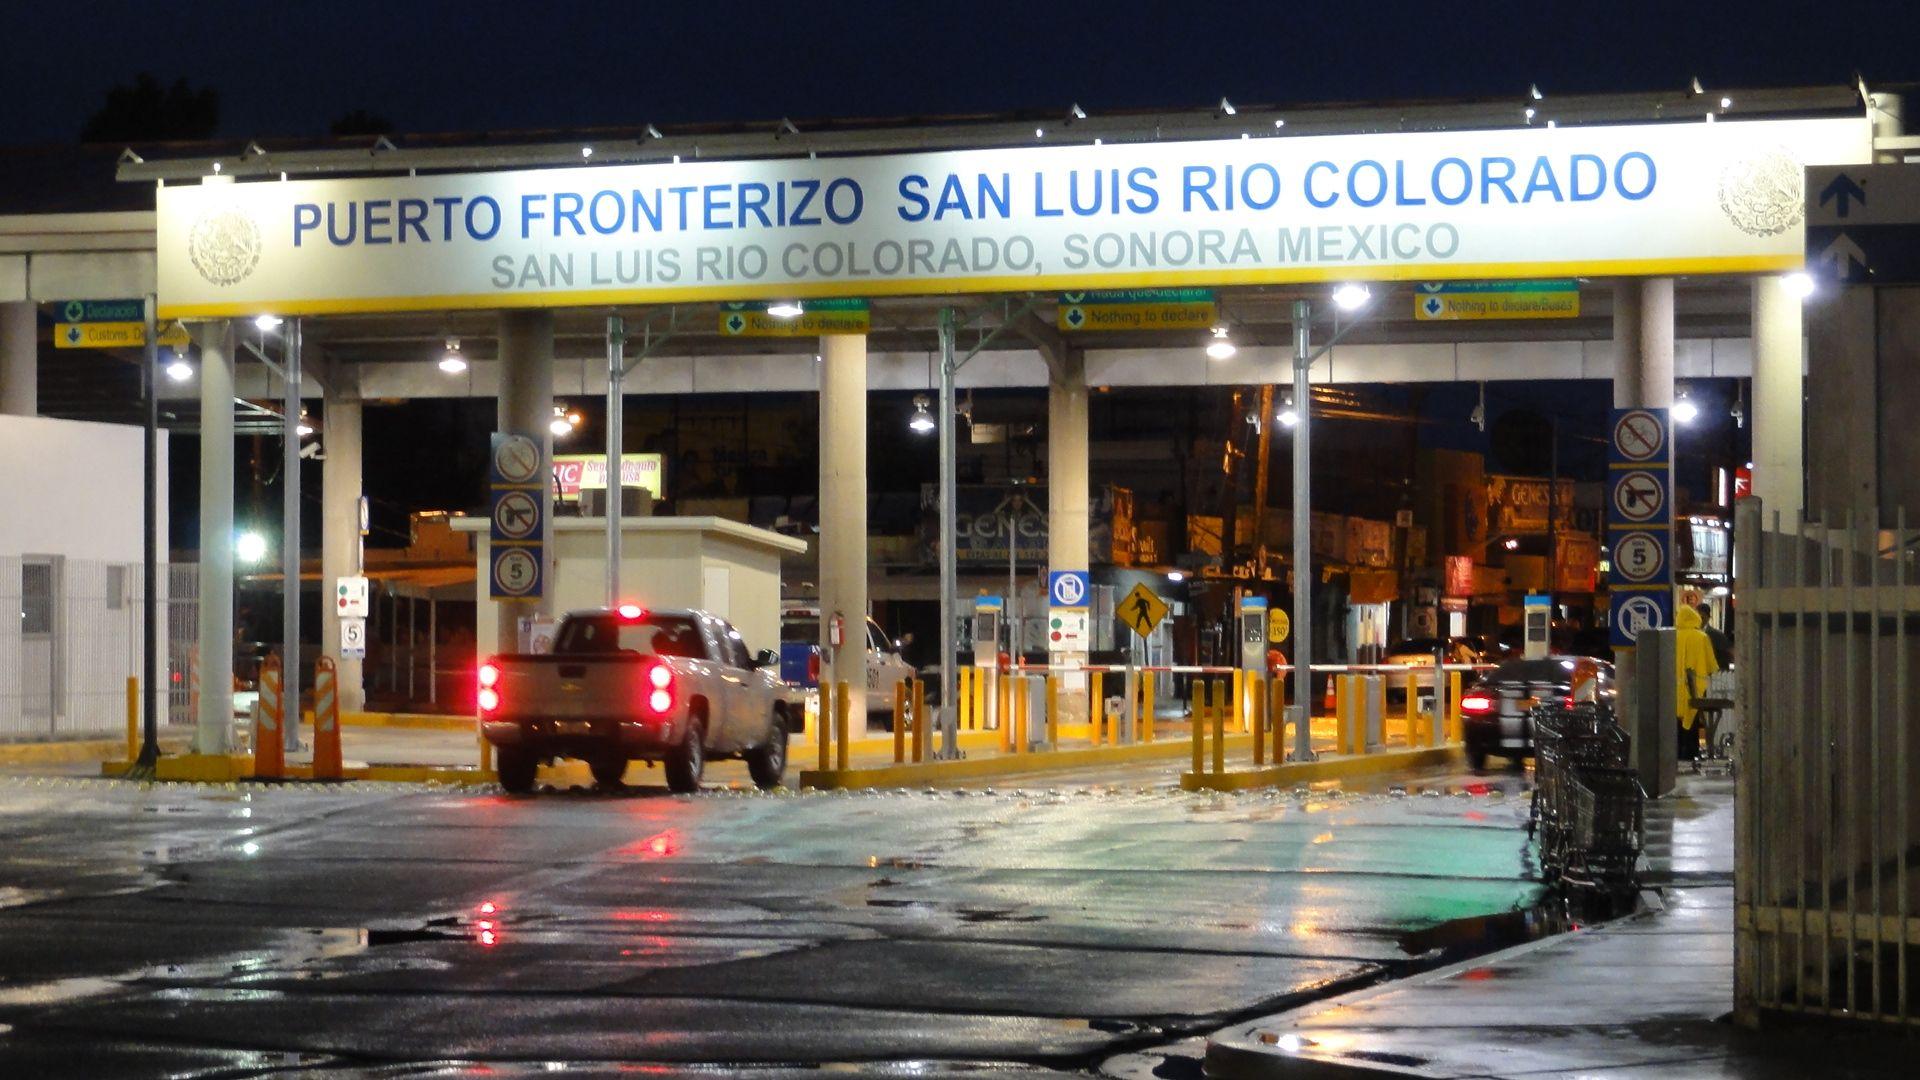 San luis rio colorado mexico